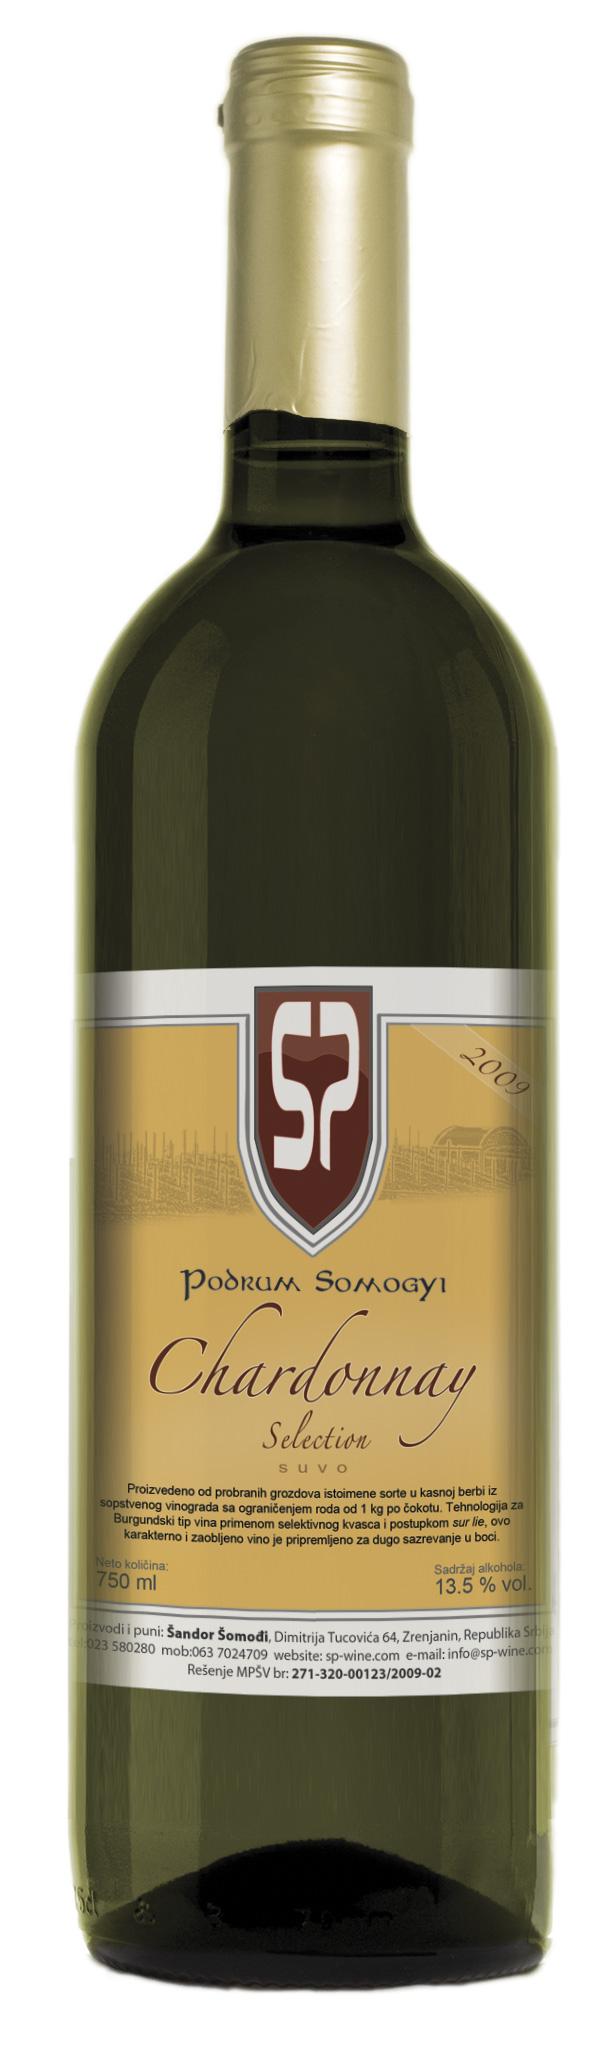 Azbuka napitaka  - Page 3 Chardonnay_2009